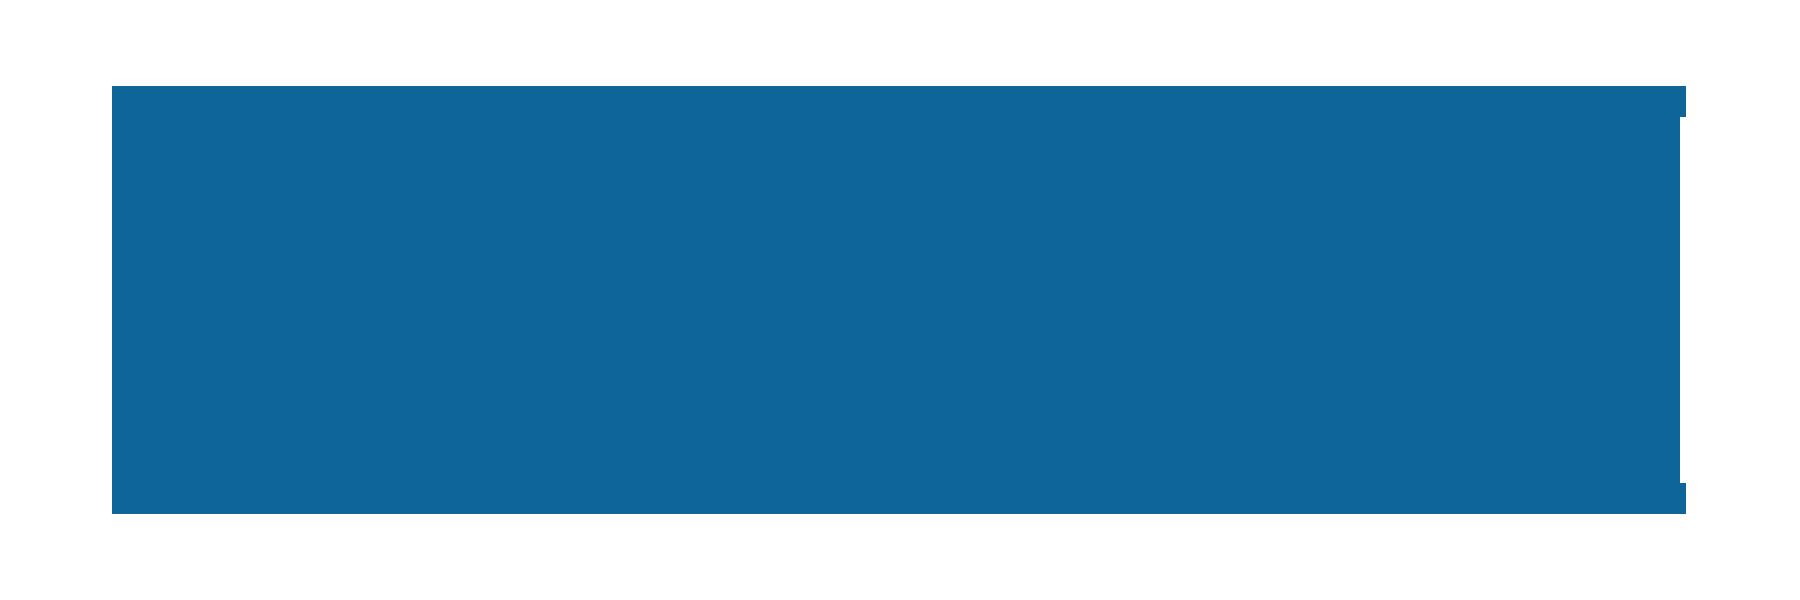 ELGL Job Board